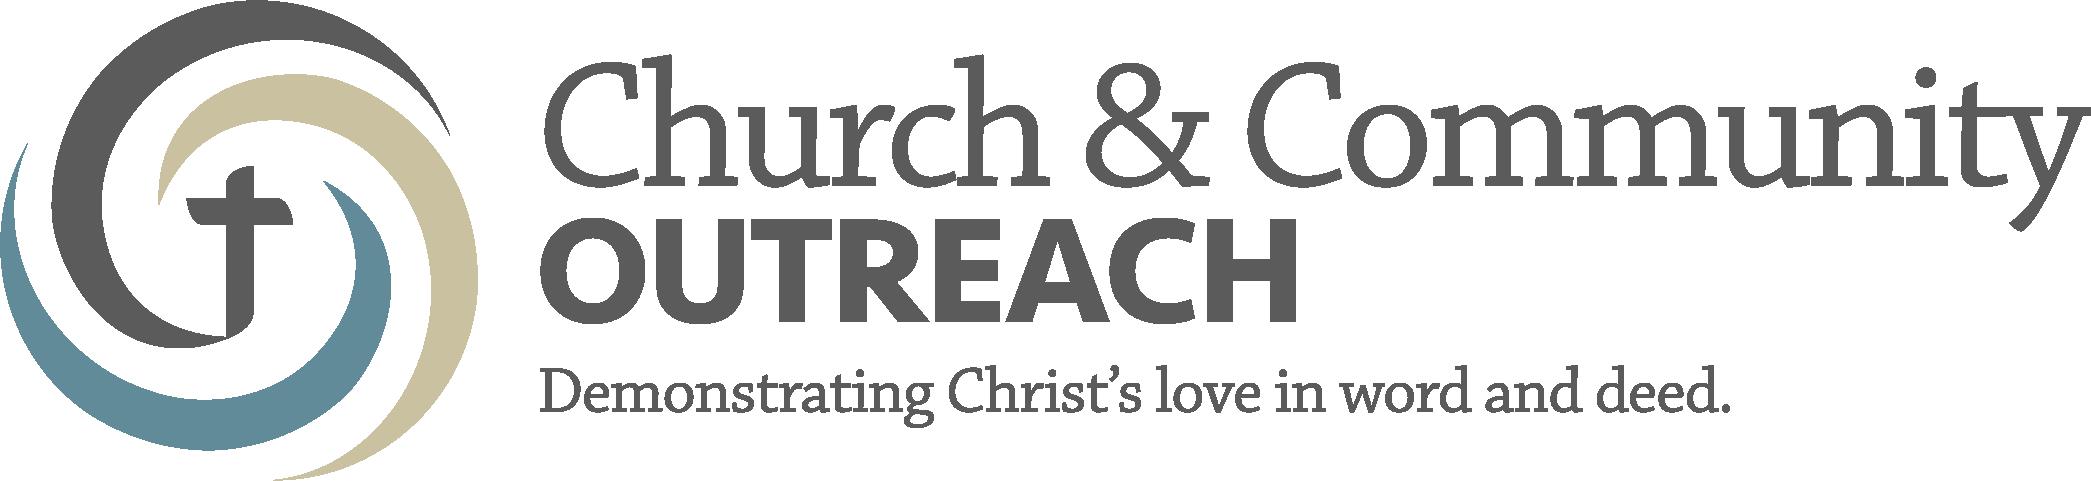 Church & Community Outreach